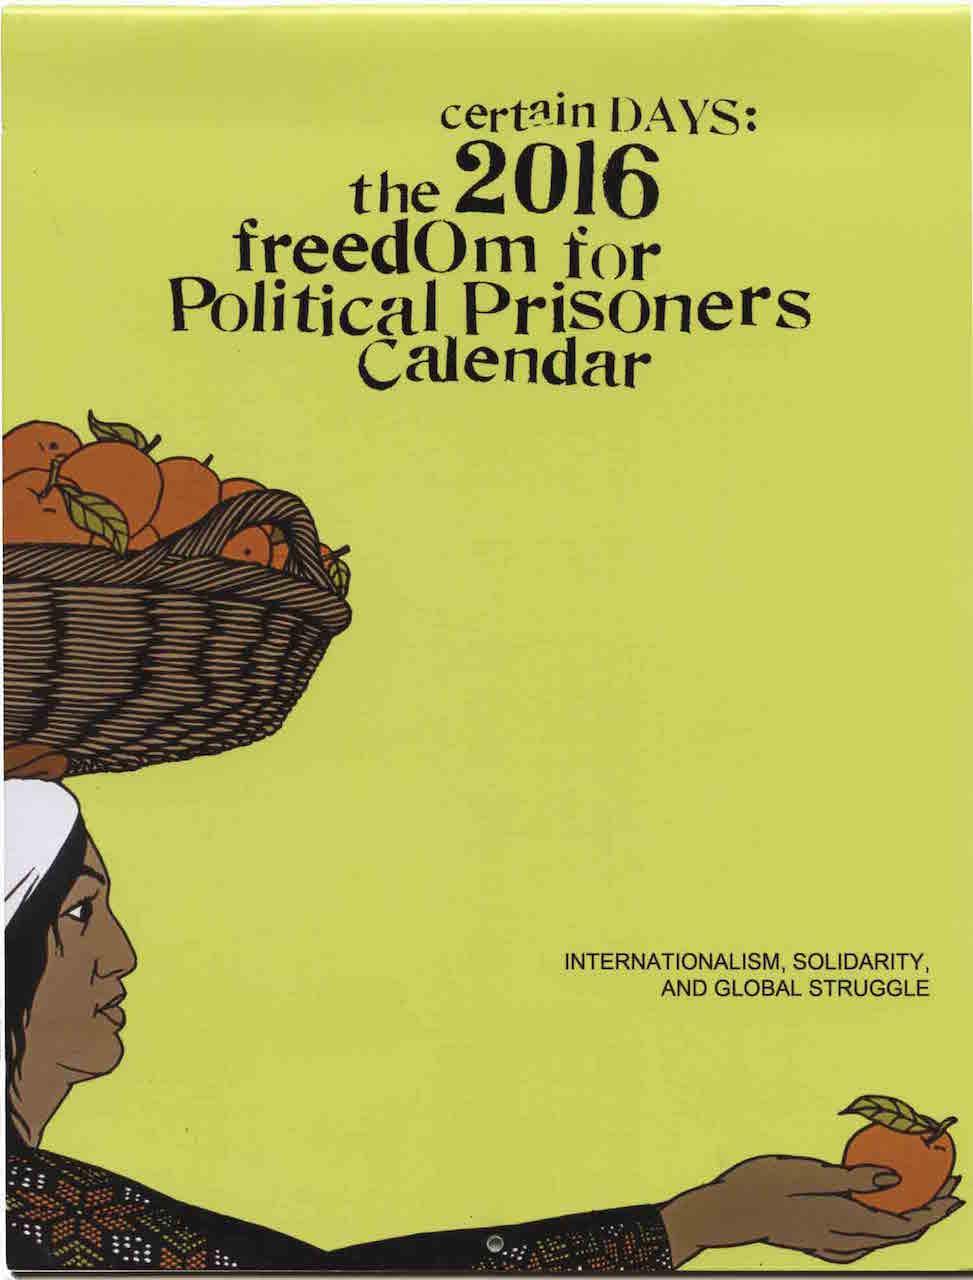 Freedom for Political Prisoners Calendar (via Justseeds)